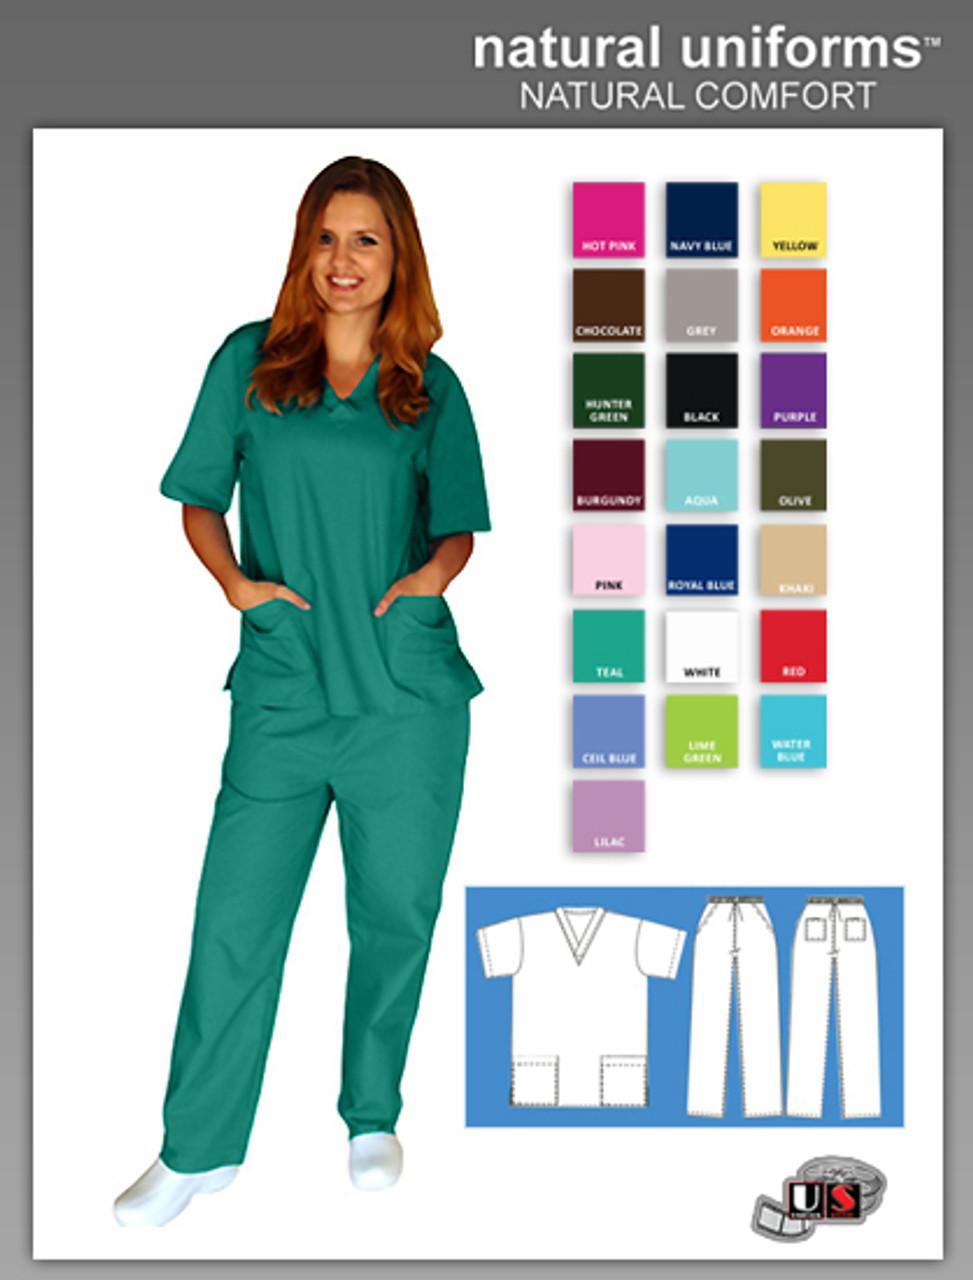 73469f2db07 Natural Uniforms Two Piece Scrub Suit (Special) - wholesaleuniforms.info